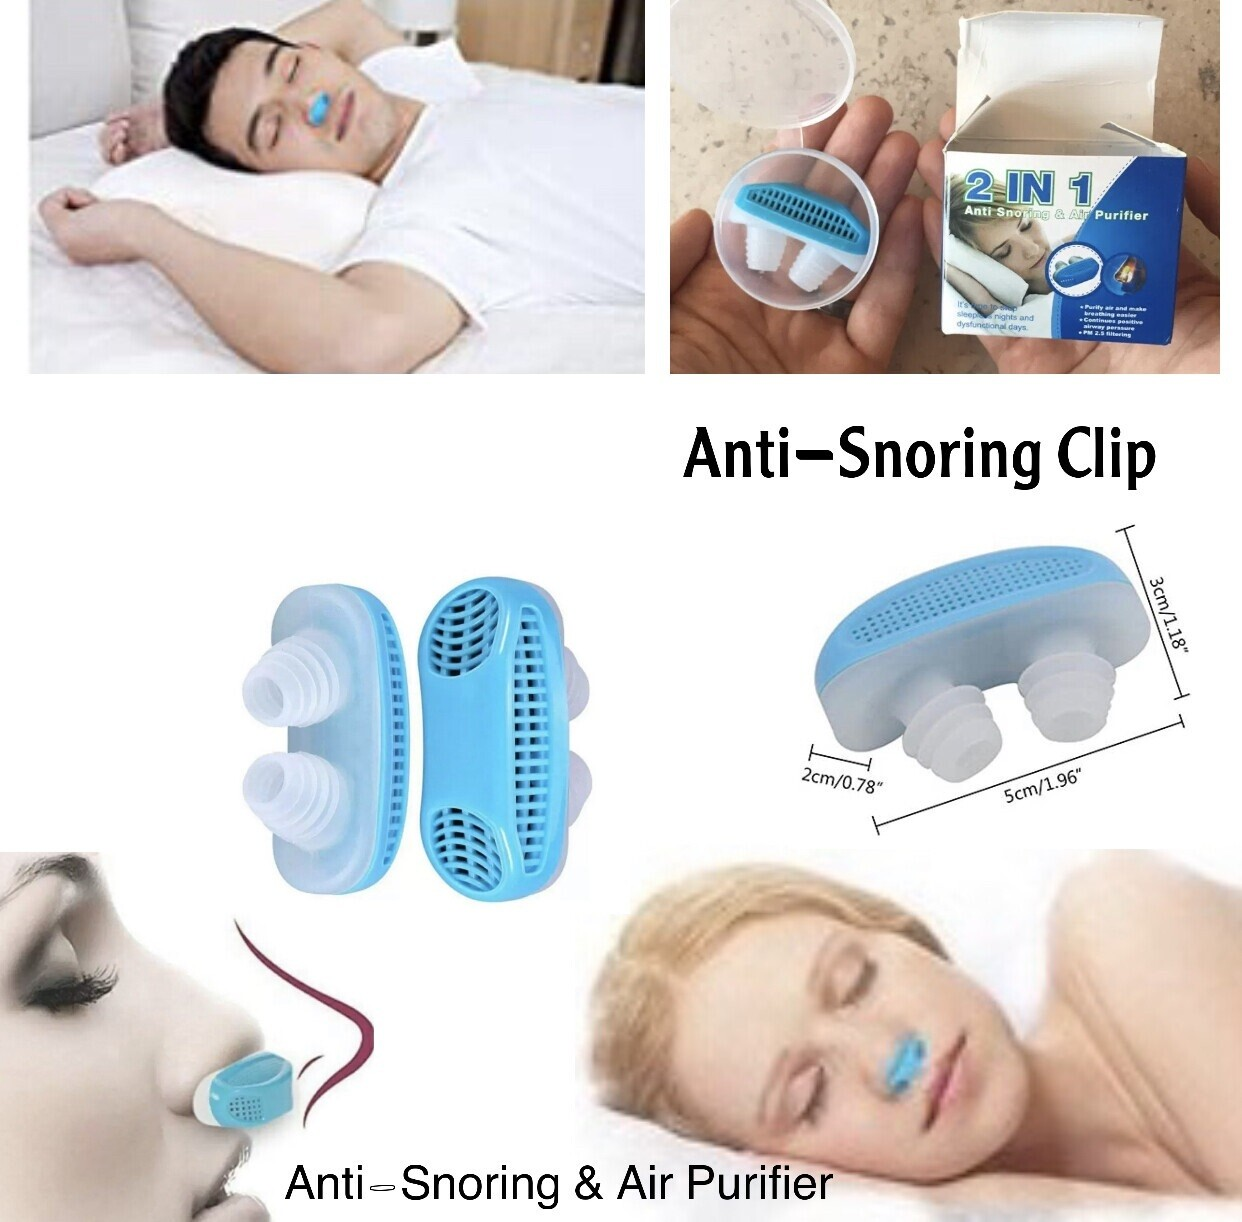 Anti-Snoring Clip